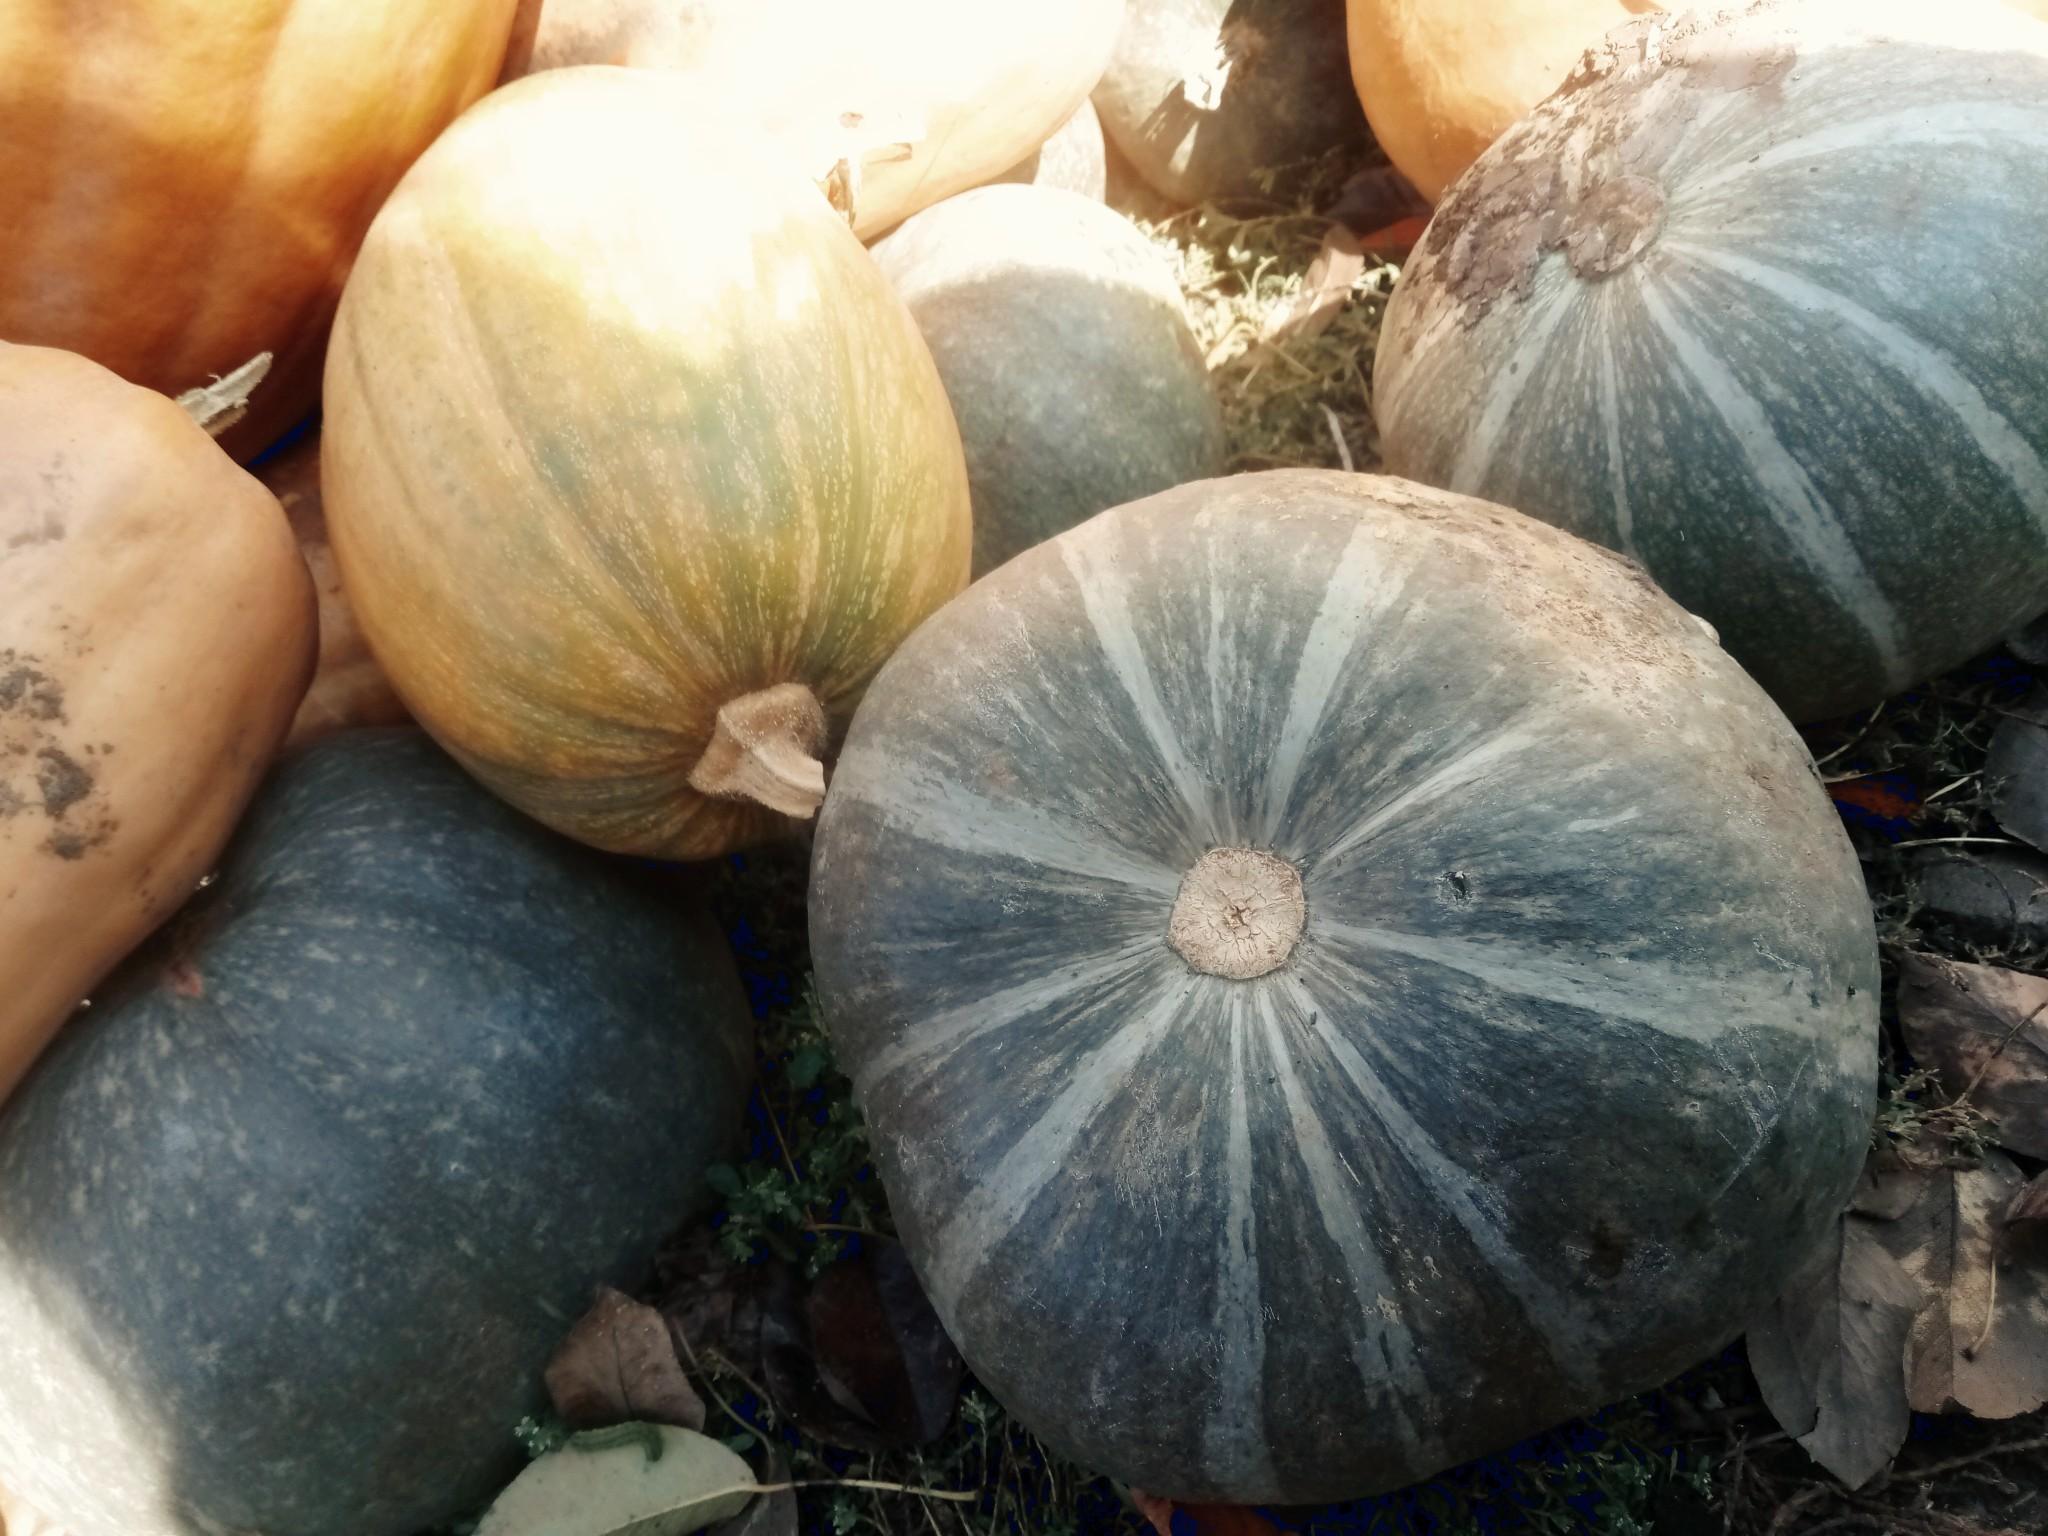 Pumpkins photo 5